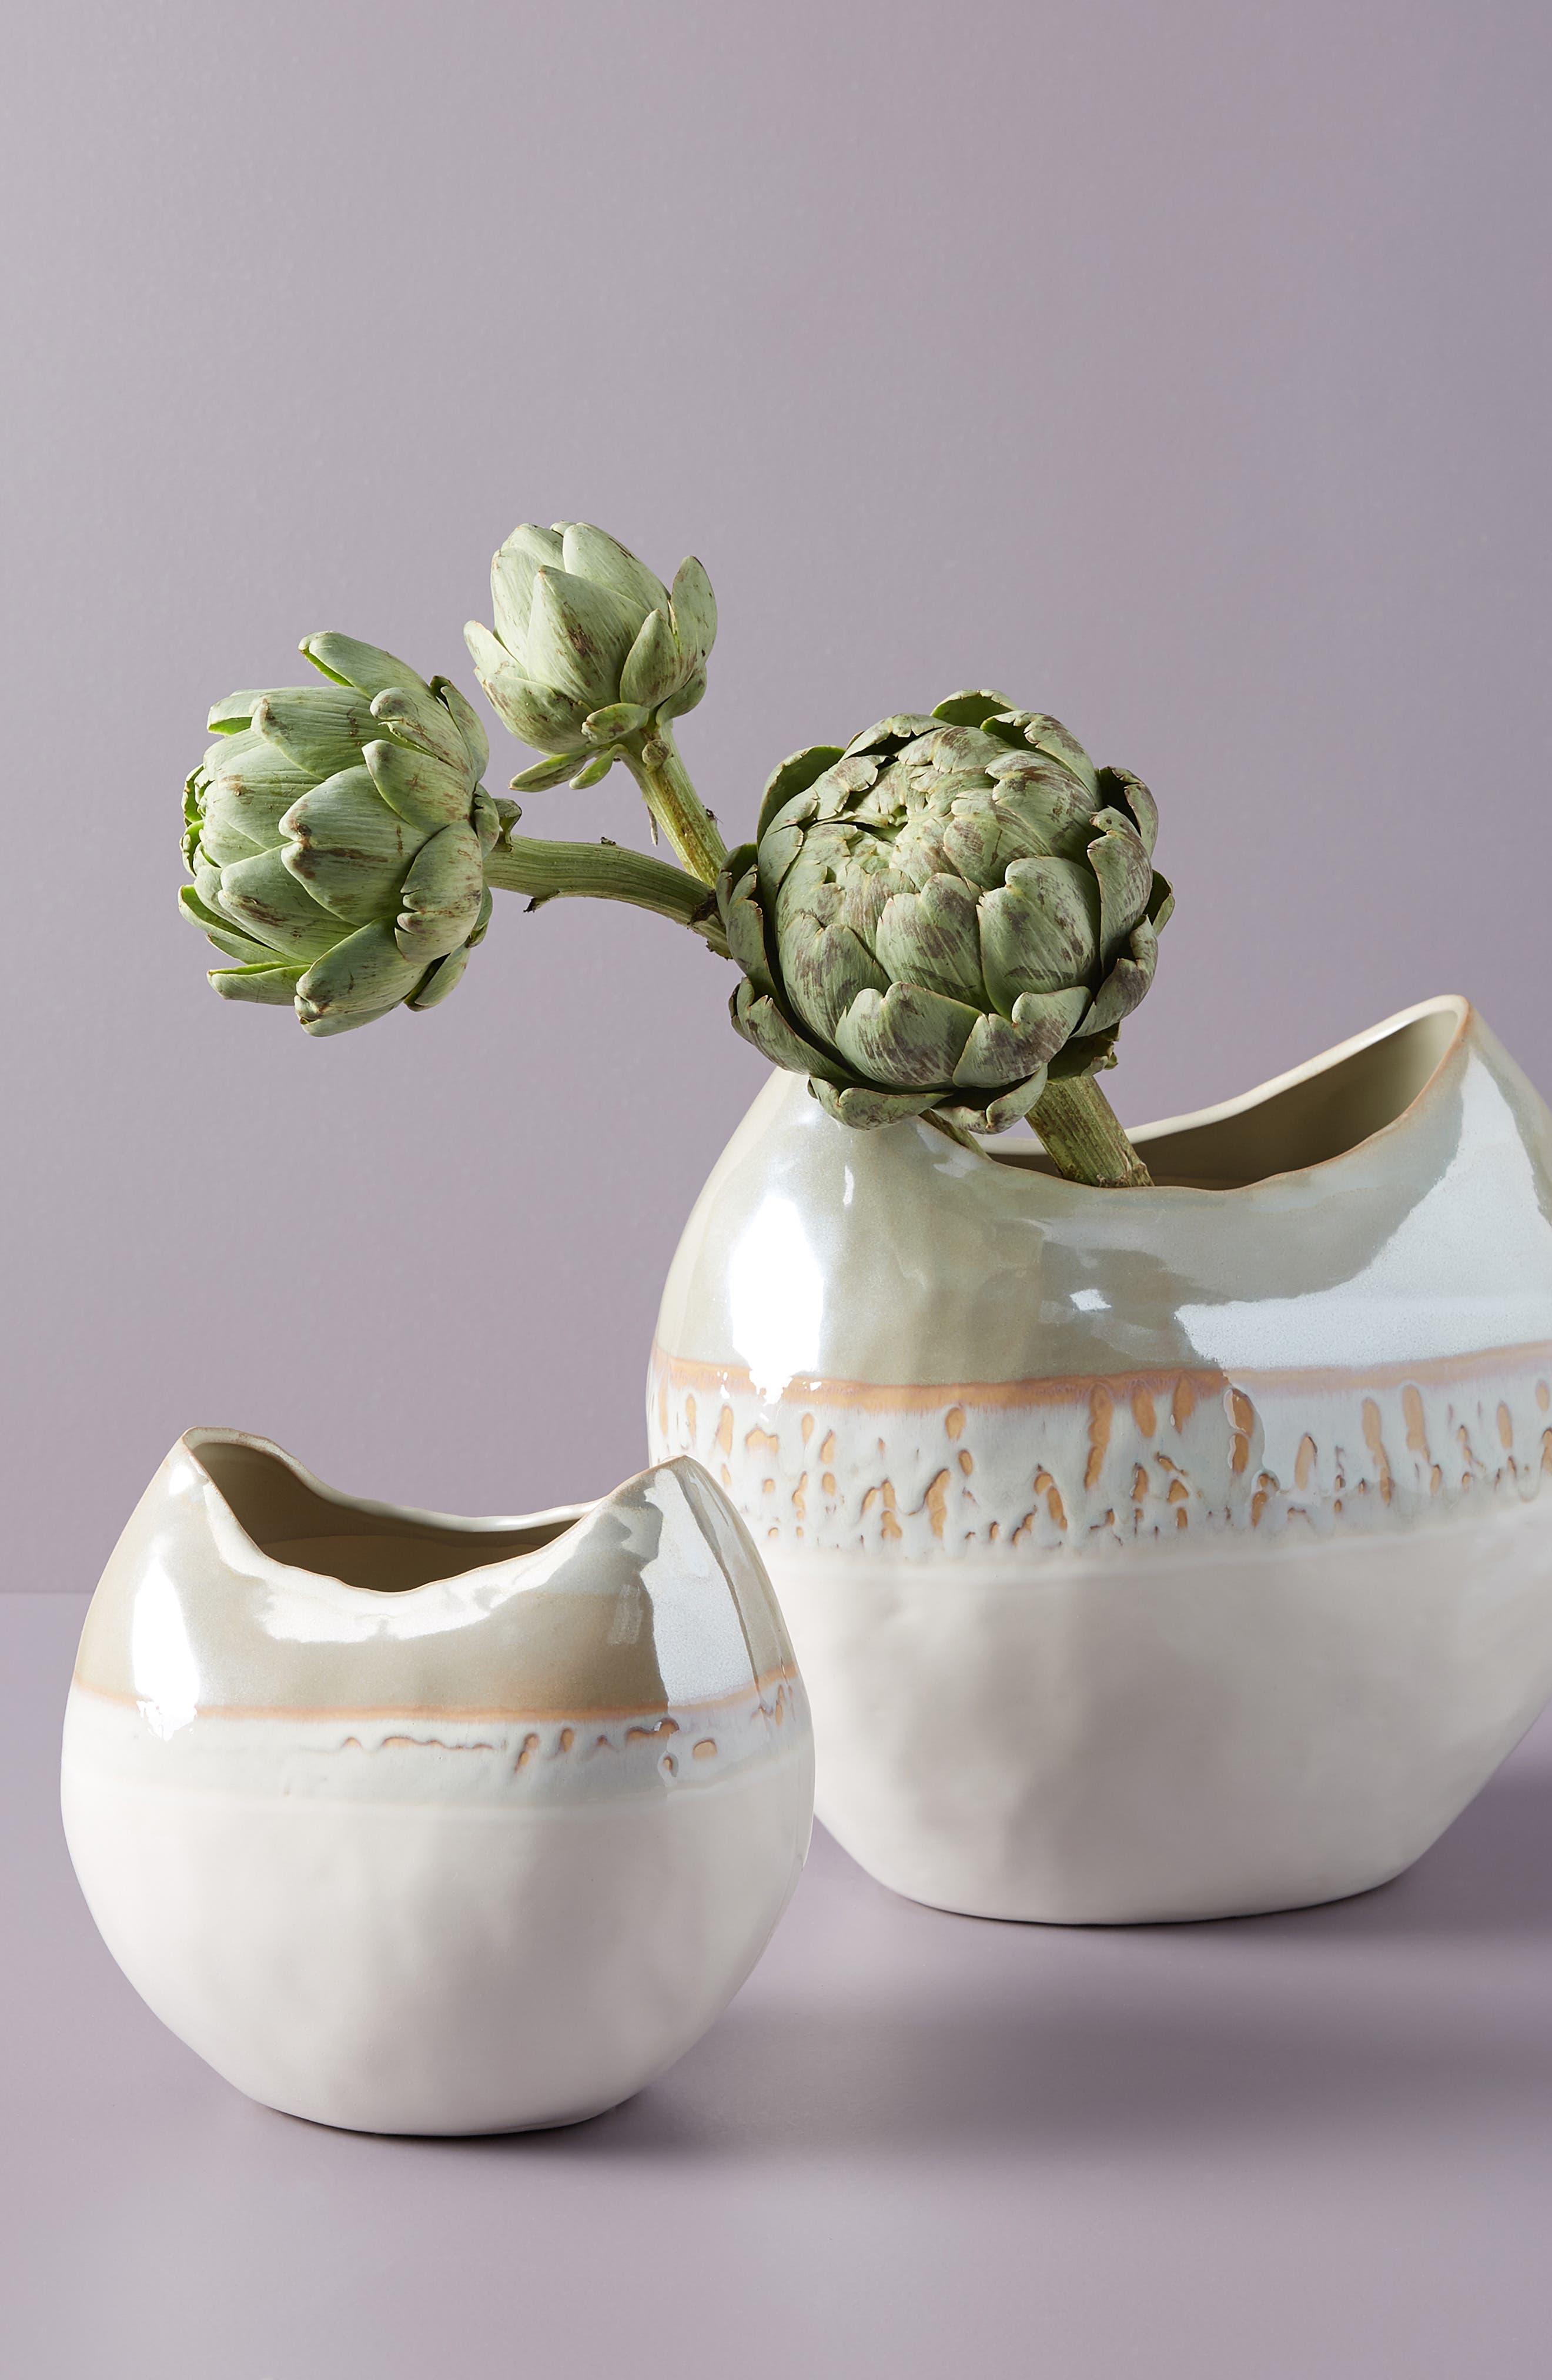 Crescent Moon Vase,                             Main thumbnail 1, color,                             WHITE LUSTER